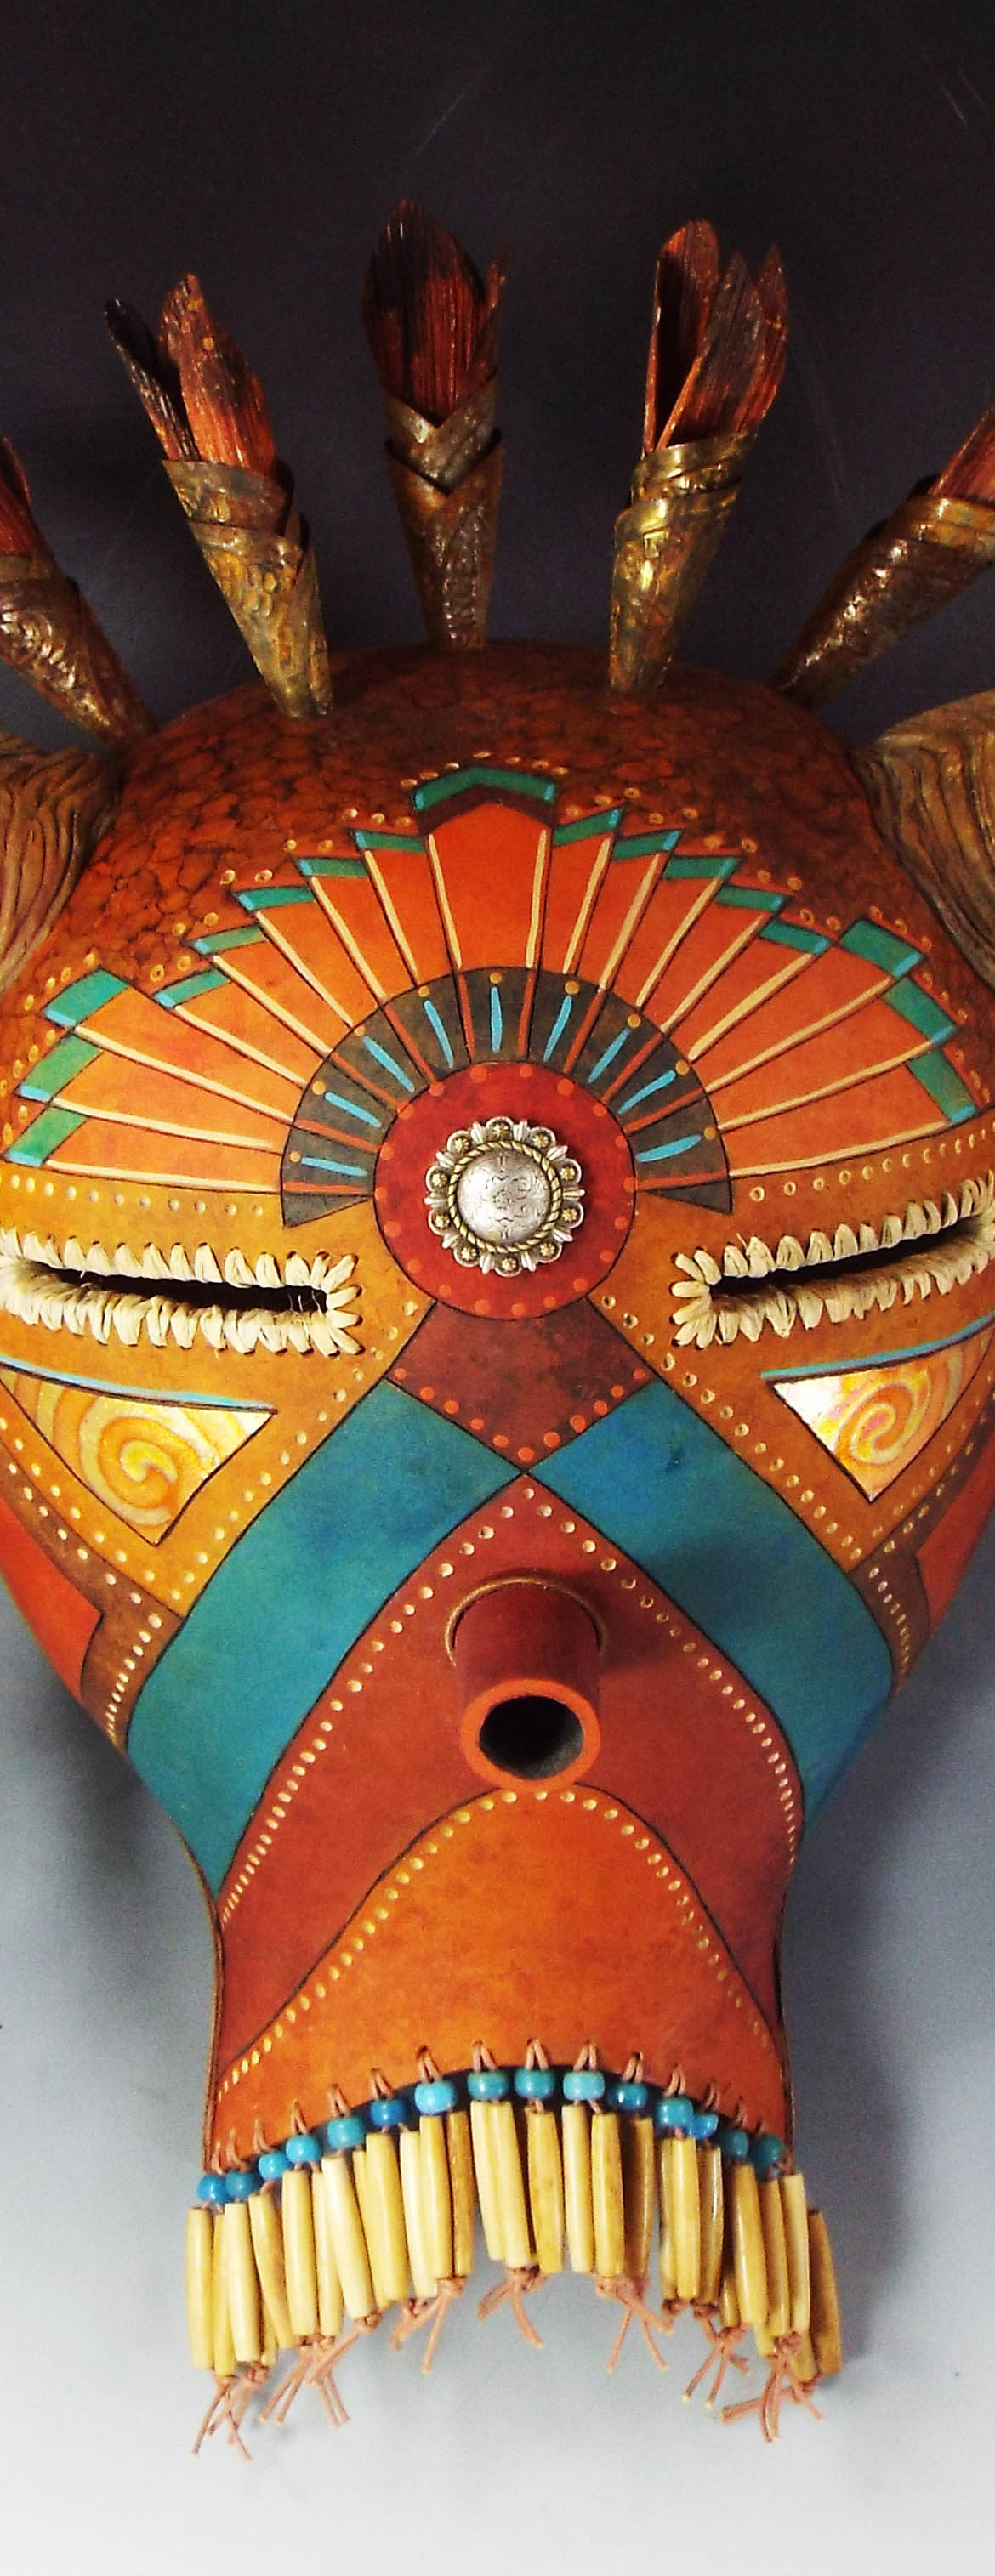 Jingle Cones, Judy Richie Gourd Art, Rogoway Gallery